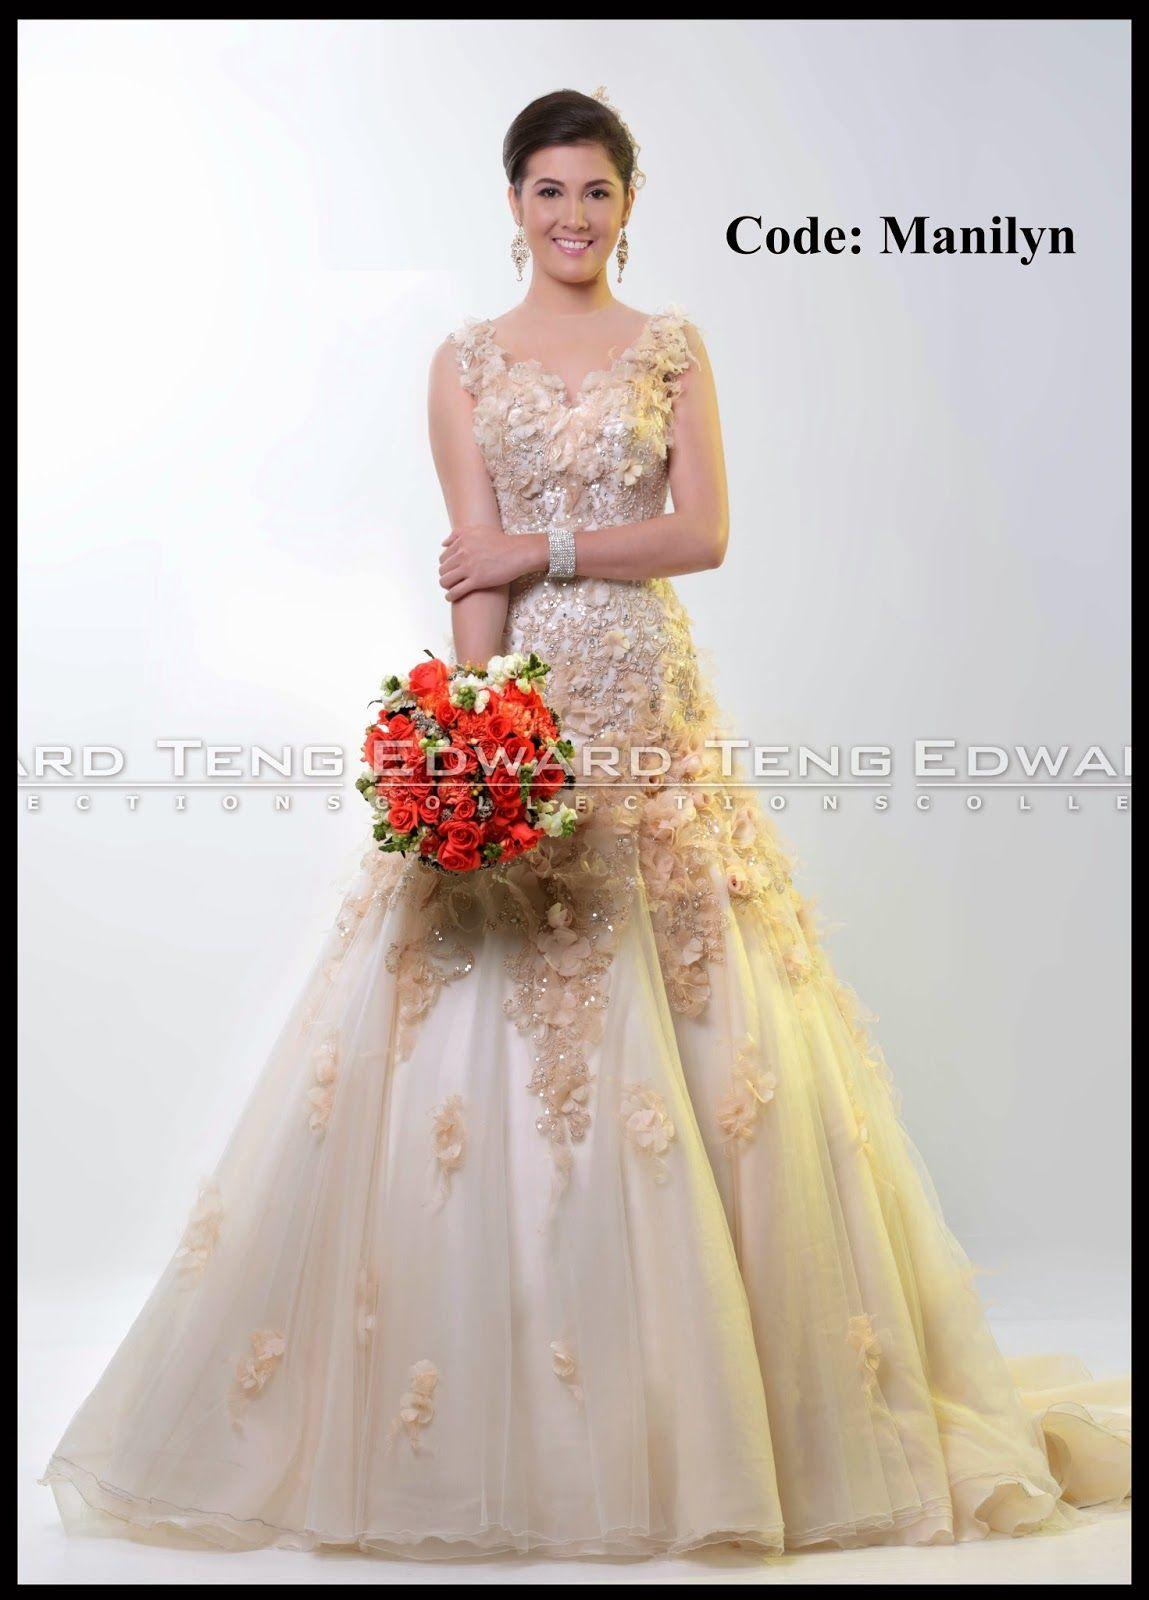 Edward Teng - Philippine Bridal Gowns | beautiful Bride | Pinterest ...